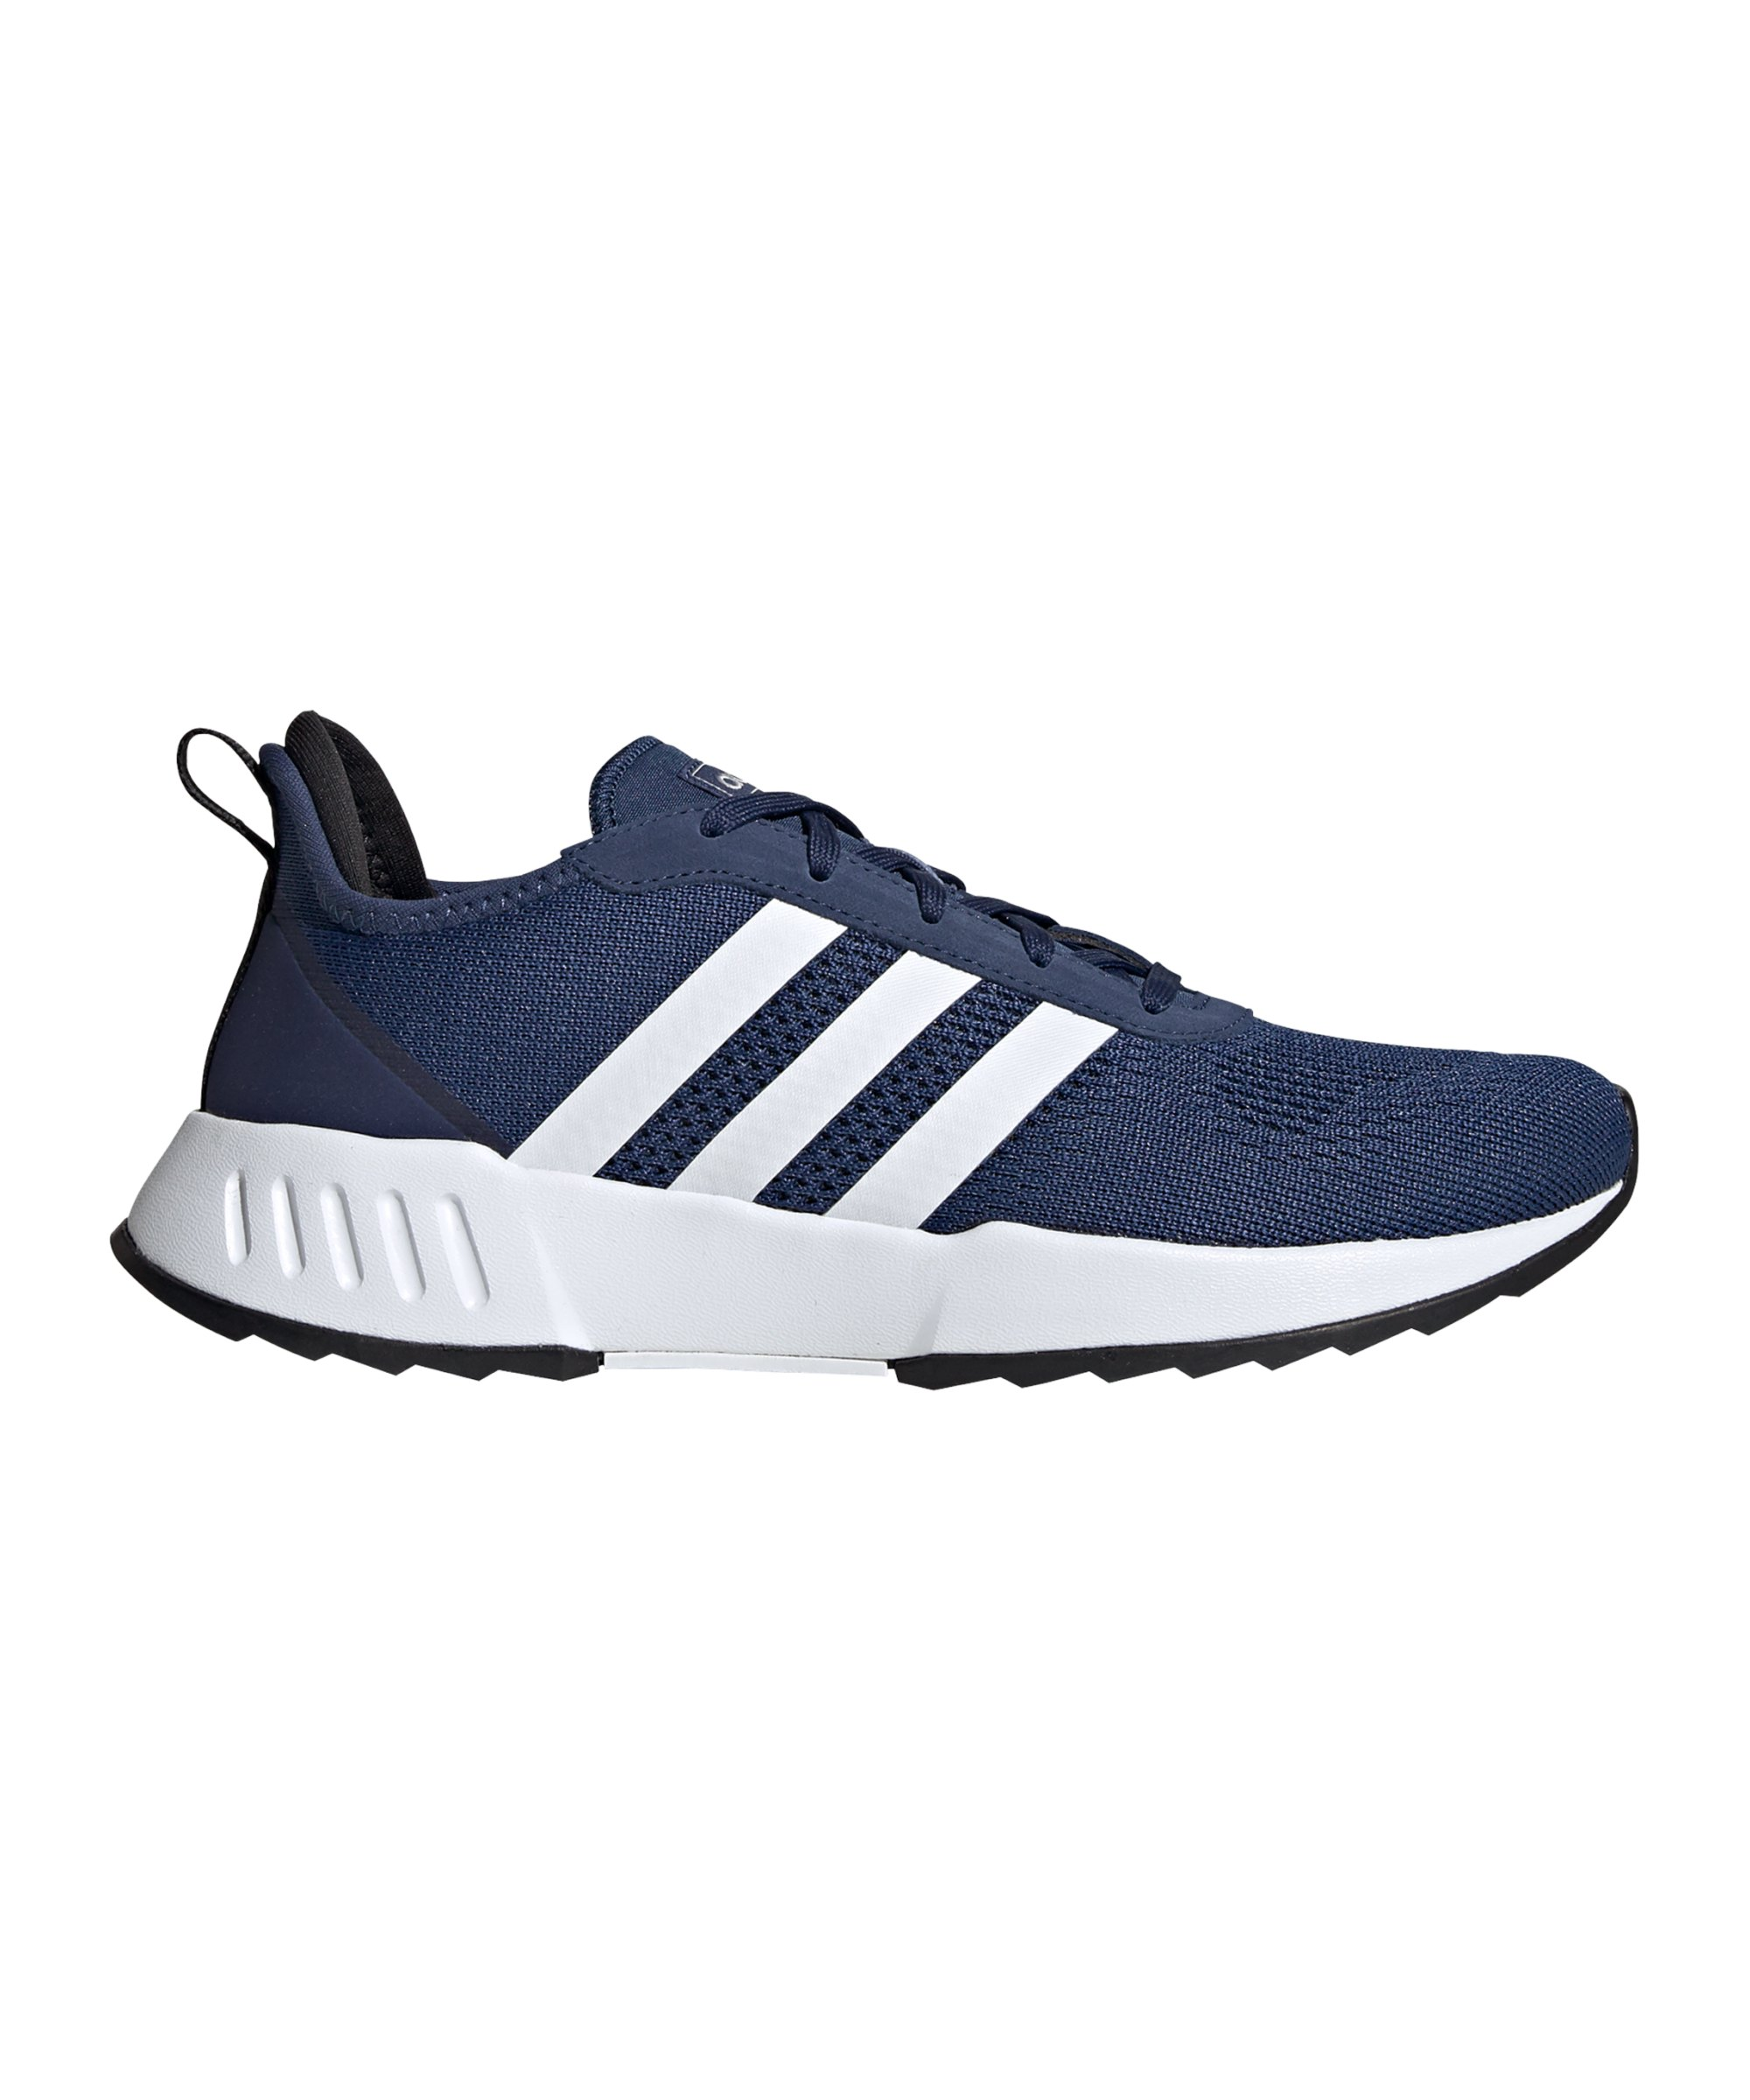 adidas Phosphere Running Blau Weiss - blau